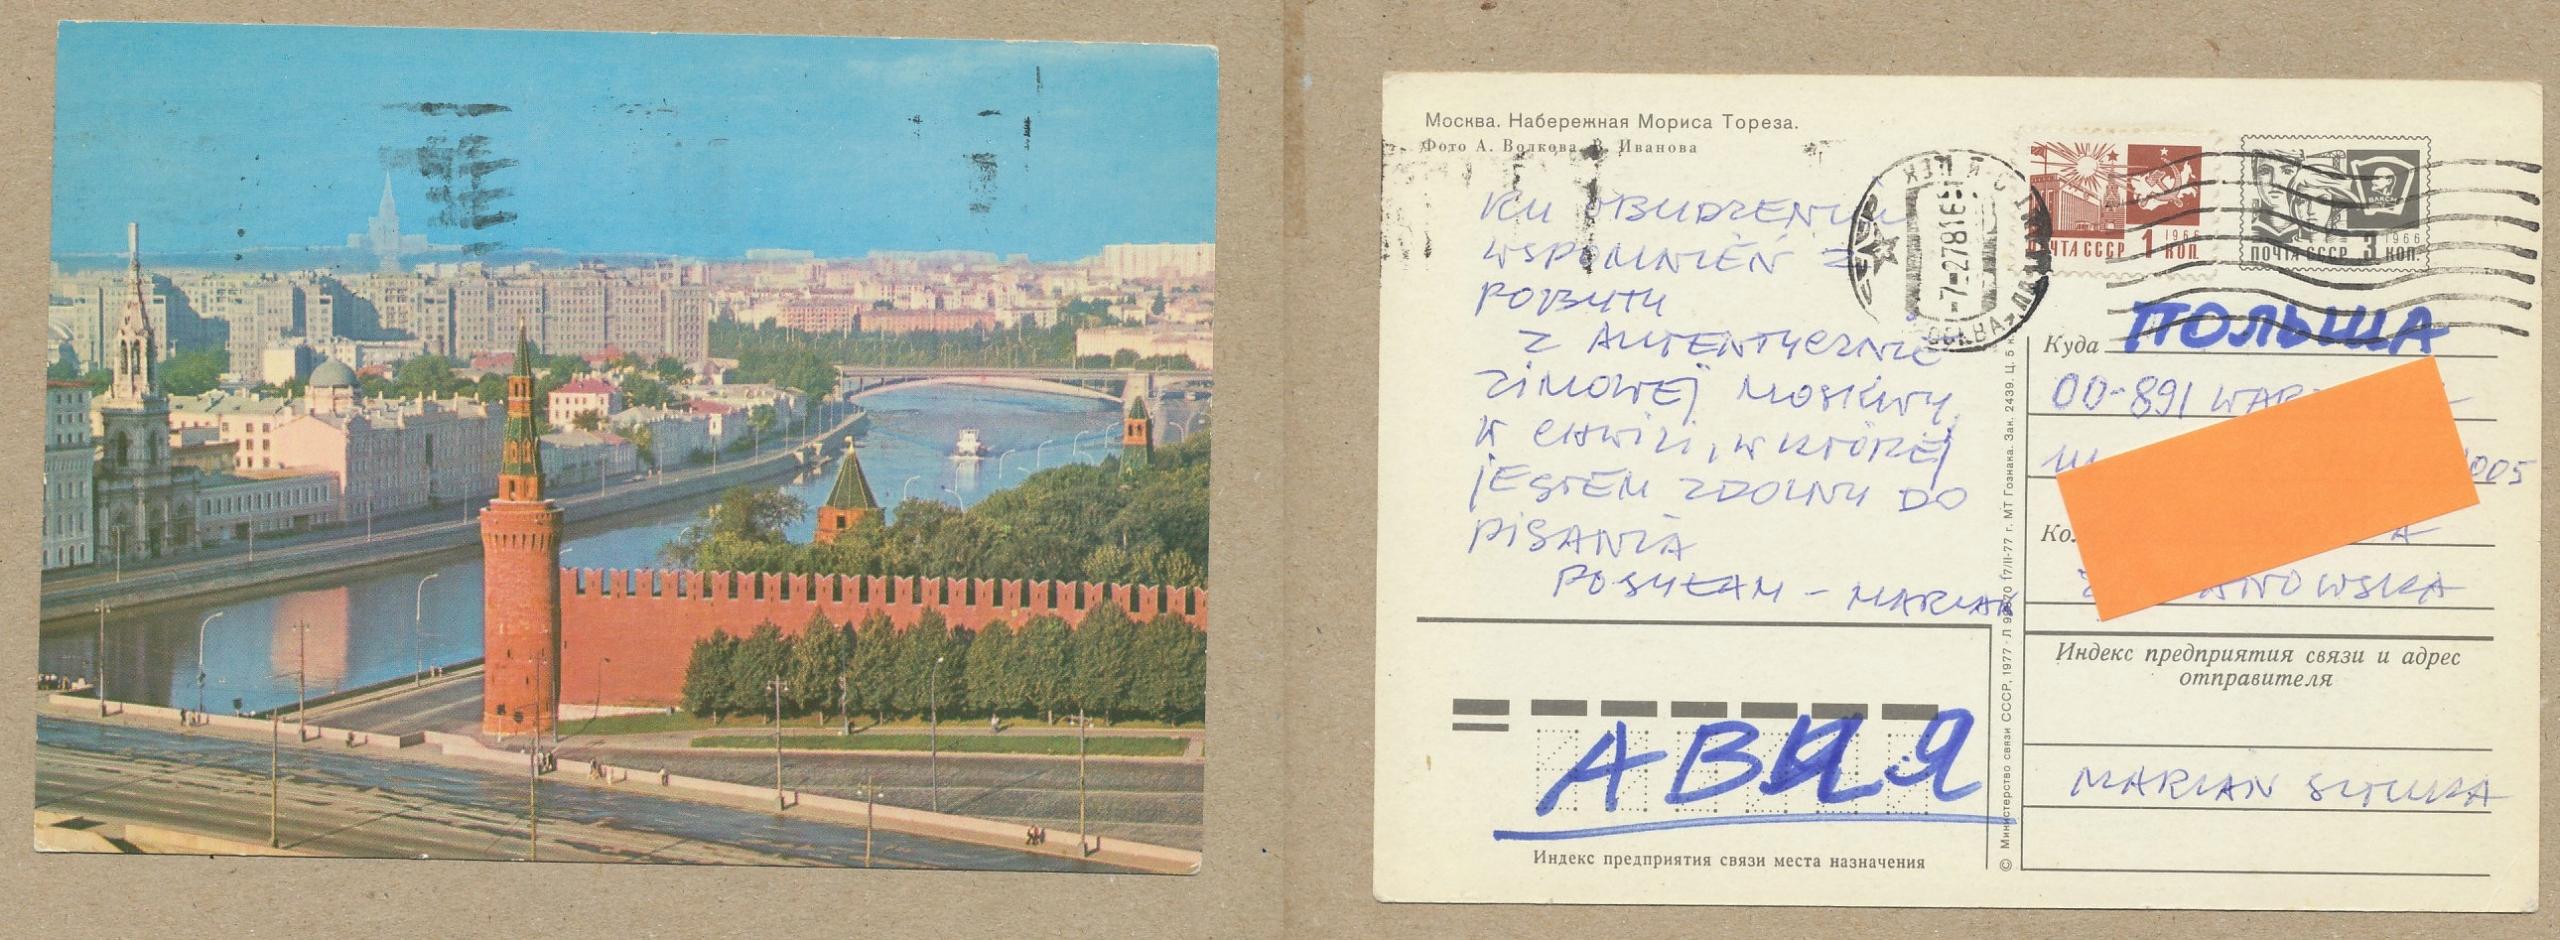 POCZTÓWKA ROSYJSKA - MOSKWA PANORAMA KREML 1977 r.